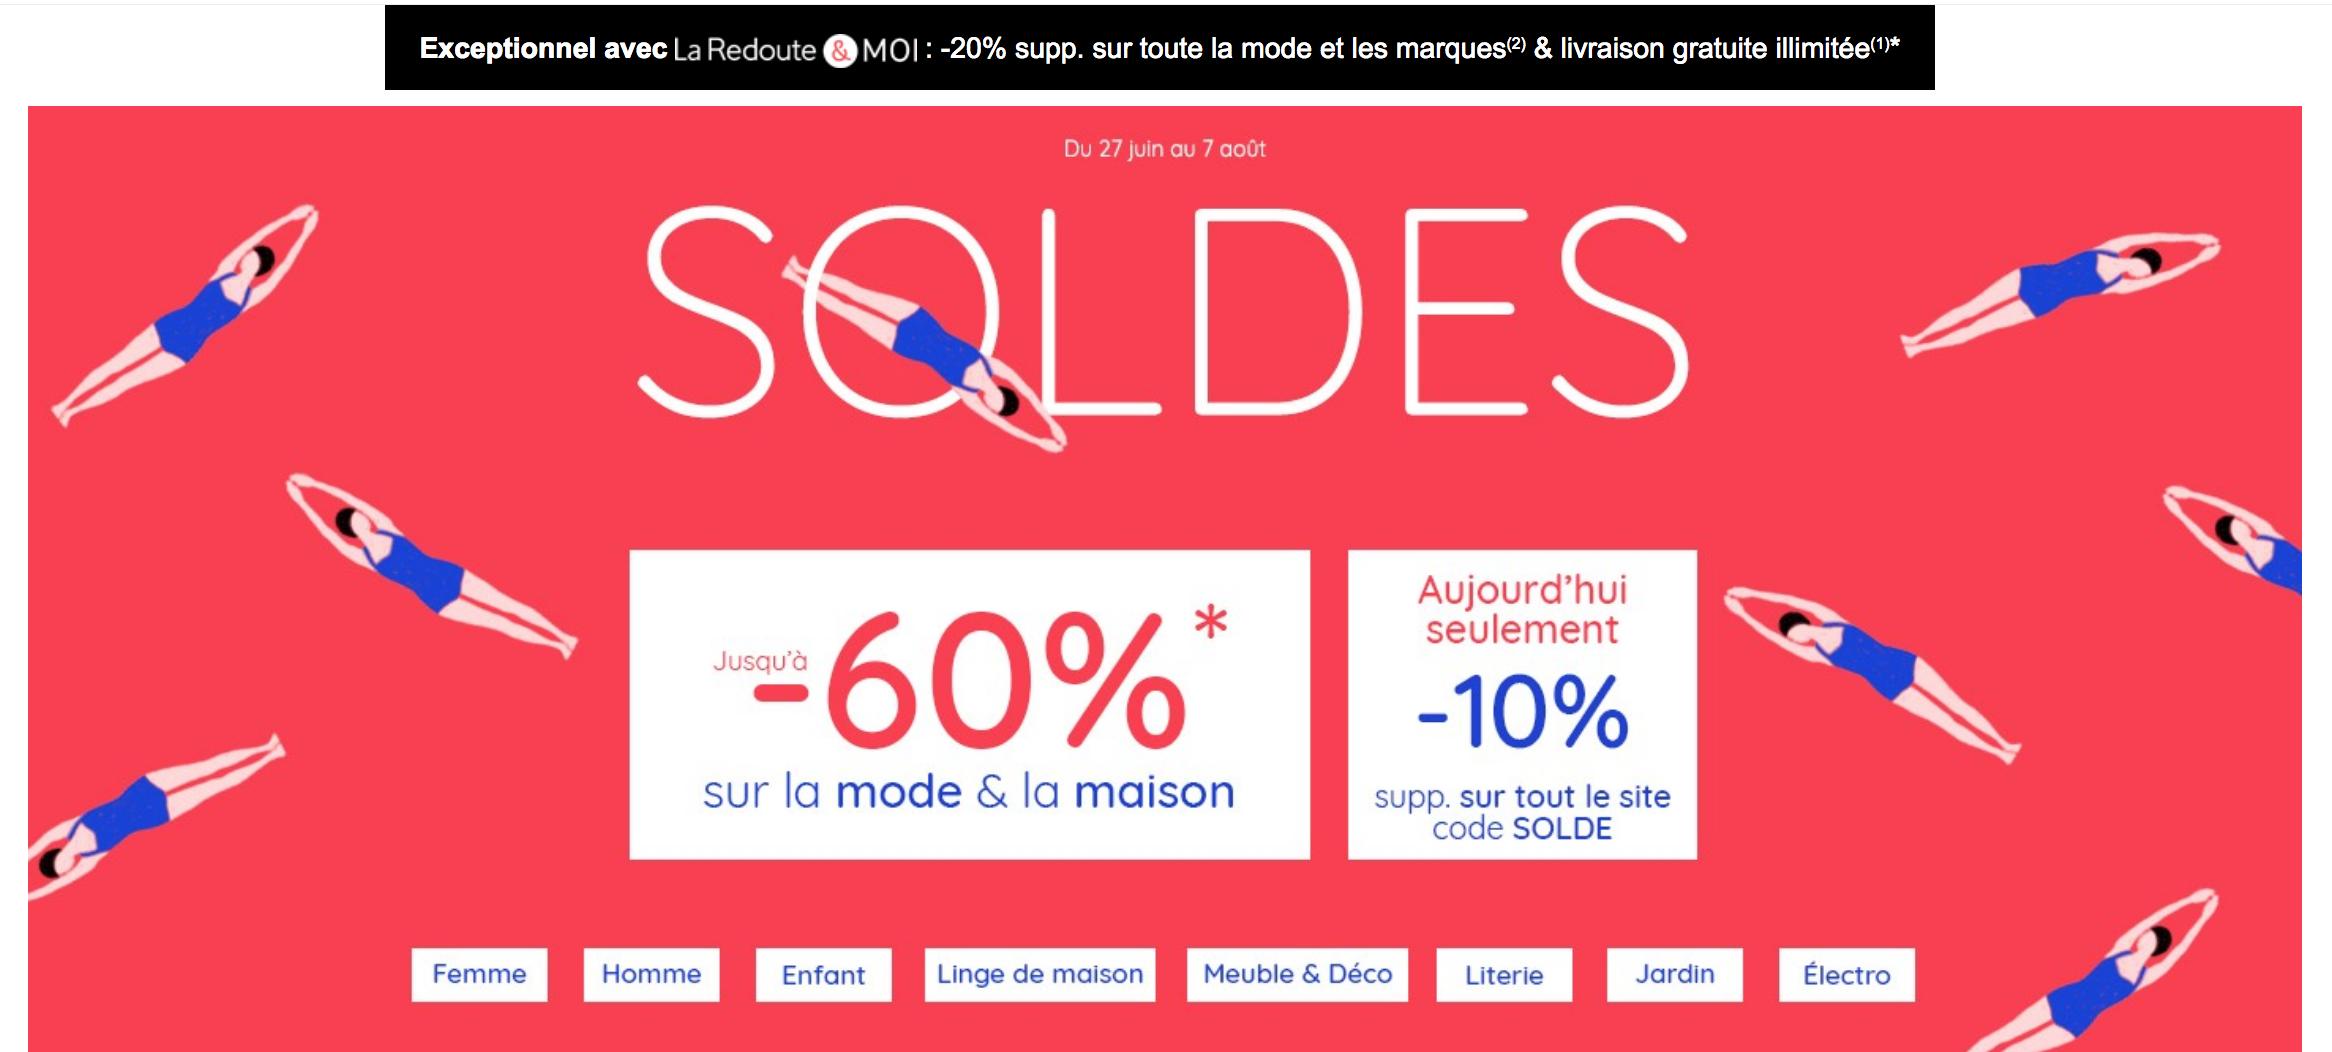 4b51aebf53f Solde la redoute - Couture Débutant